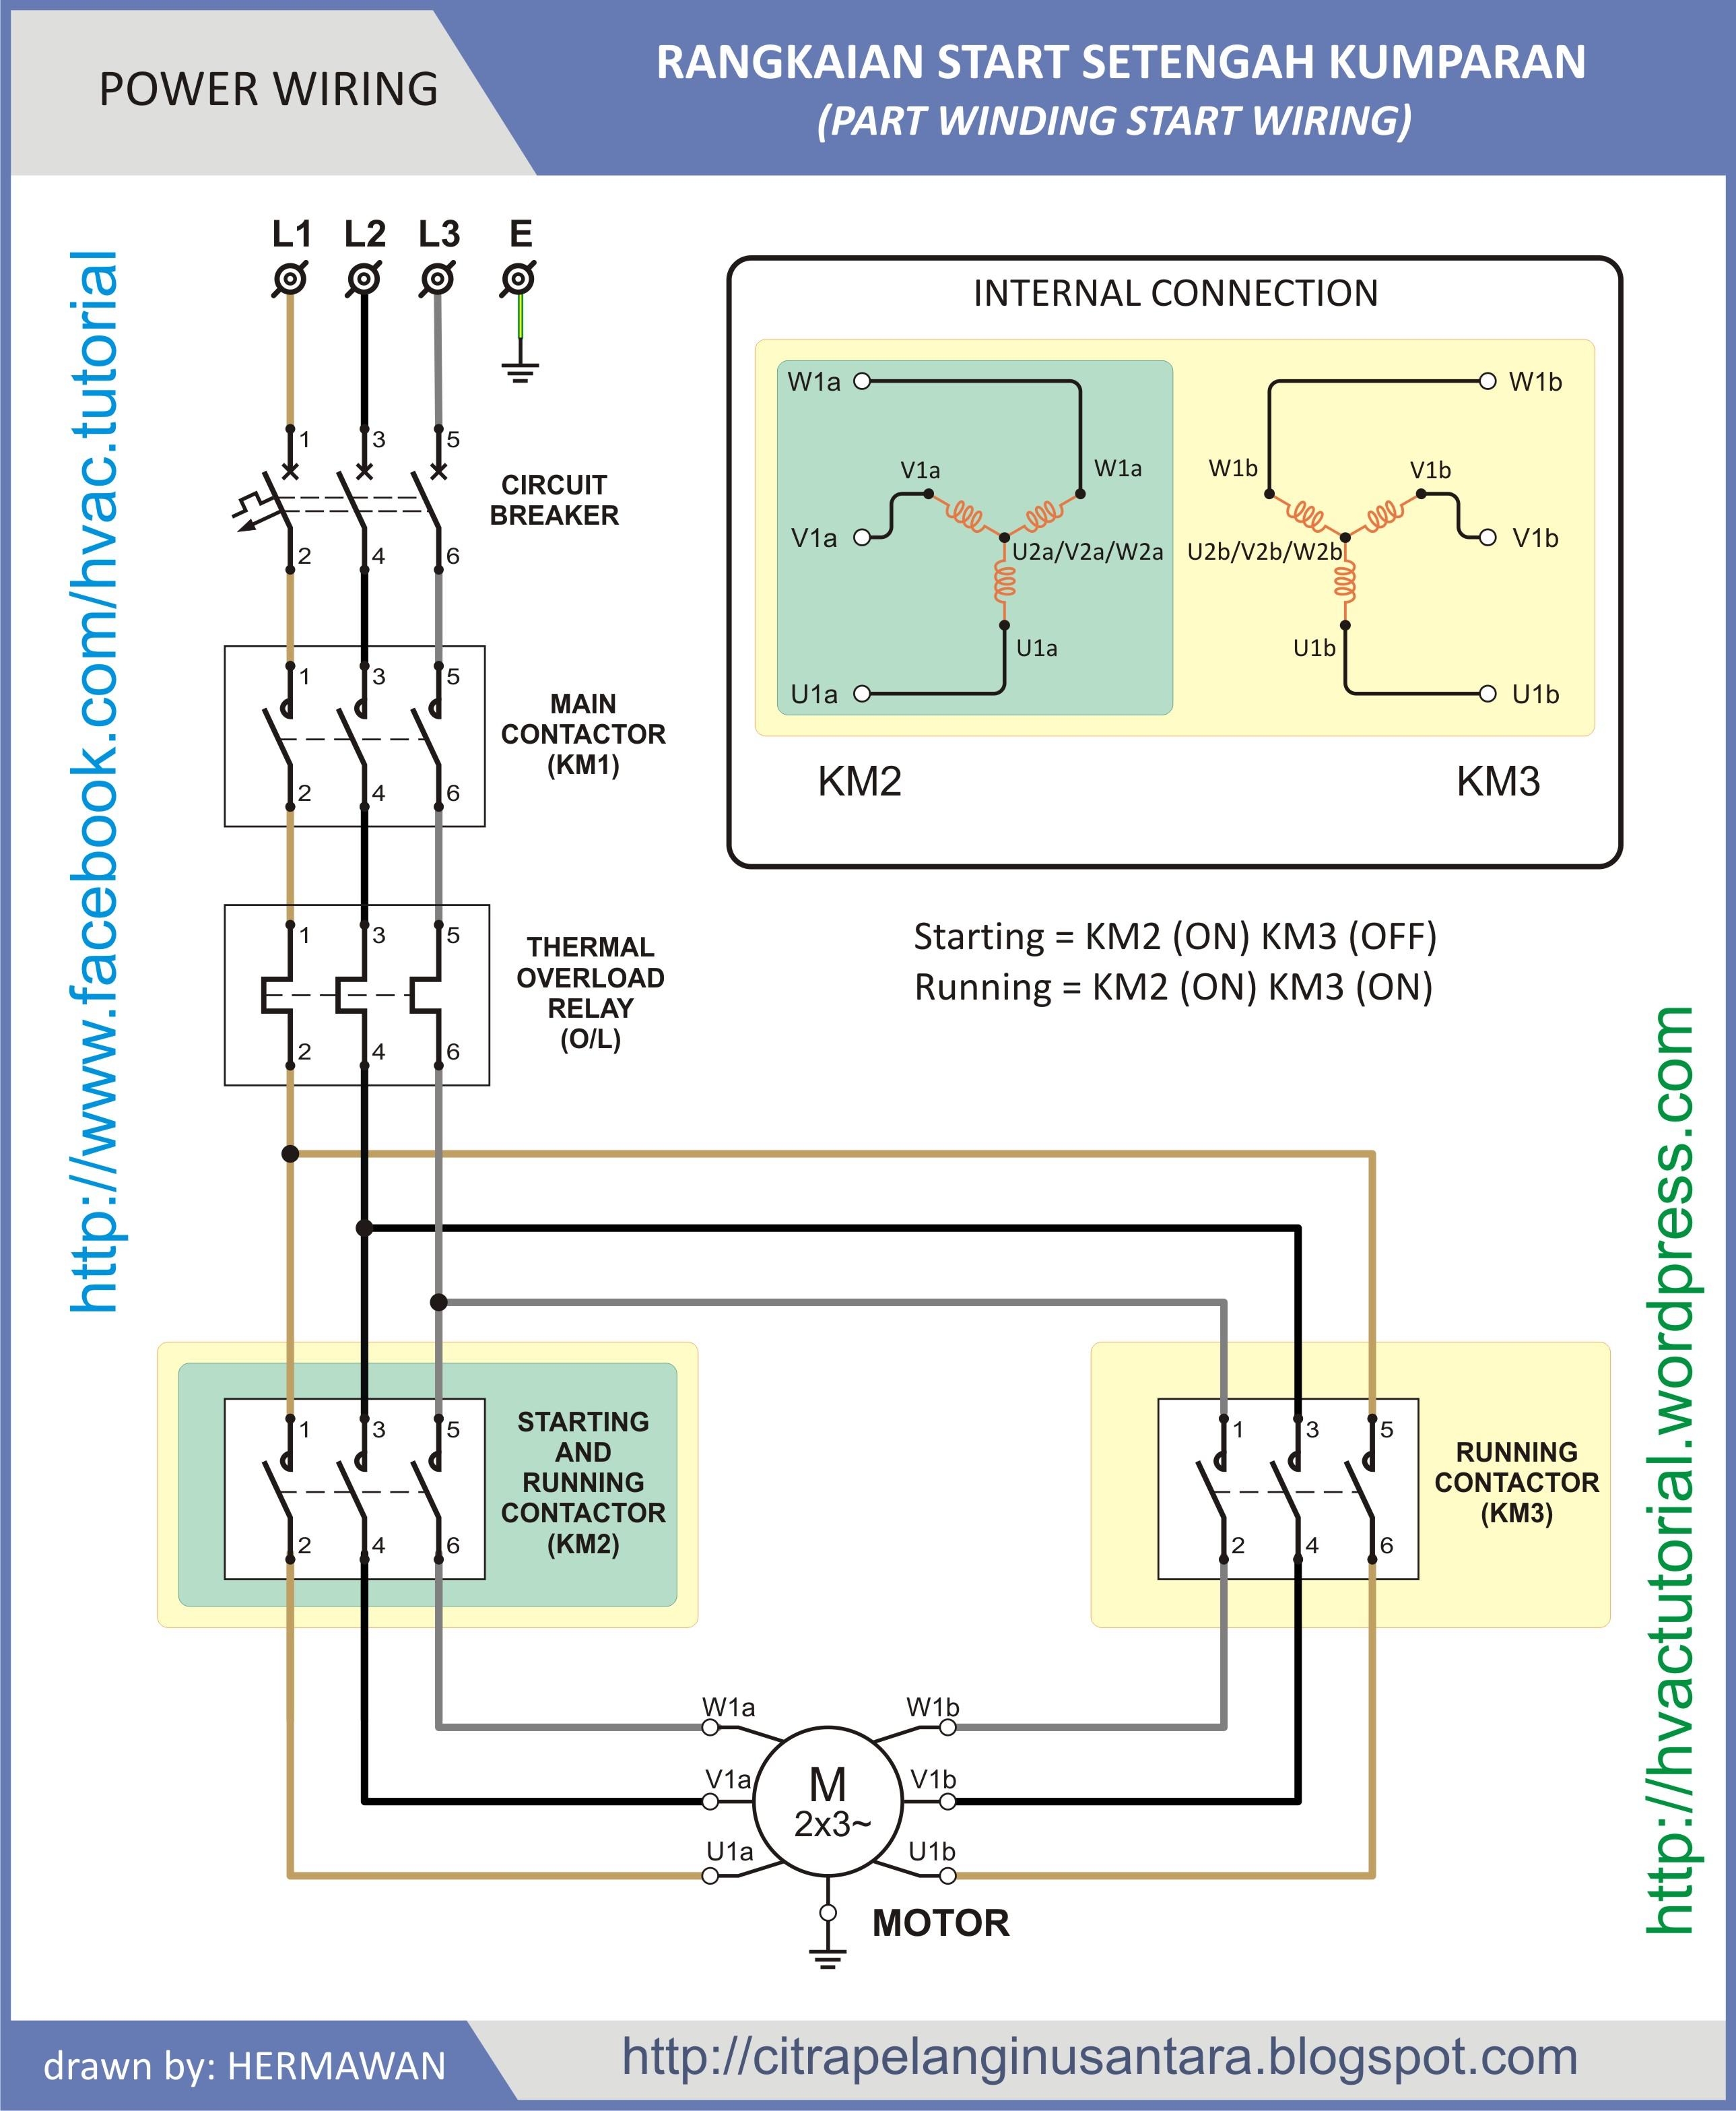 bitzer part winding motor connection diagram